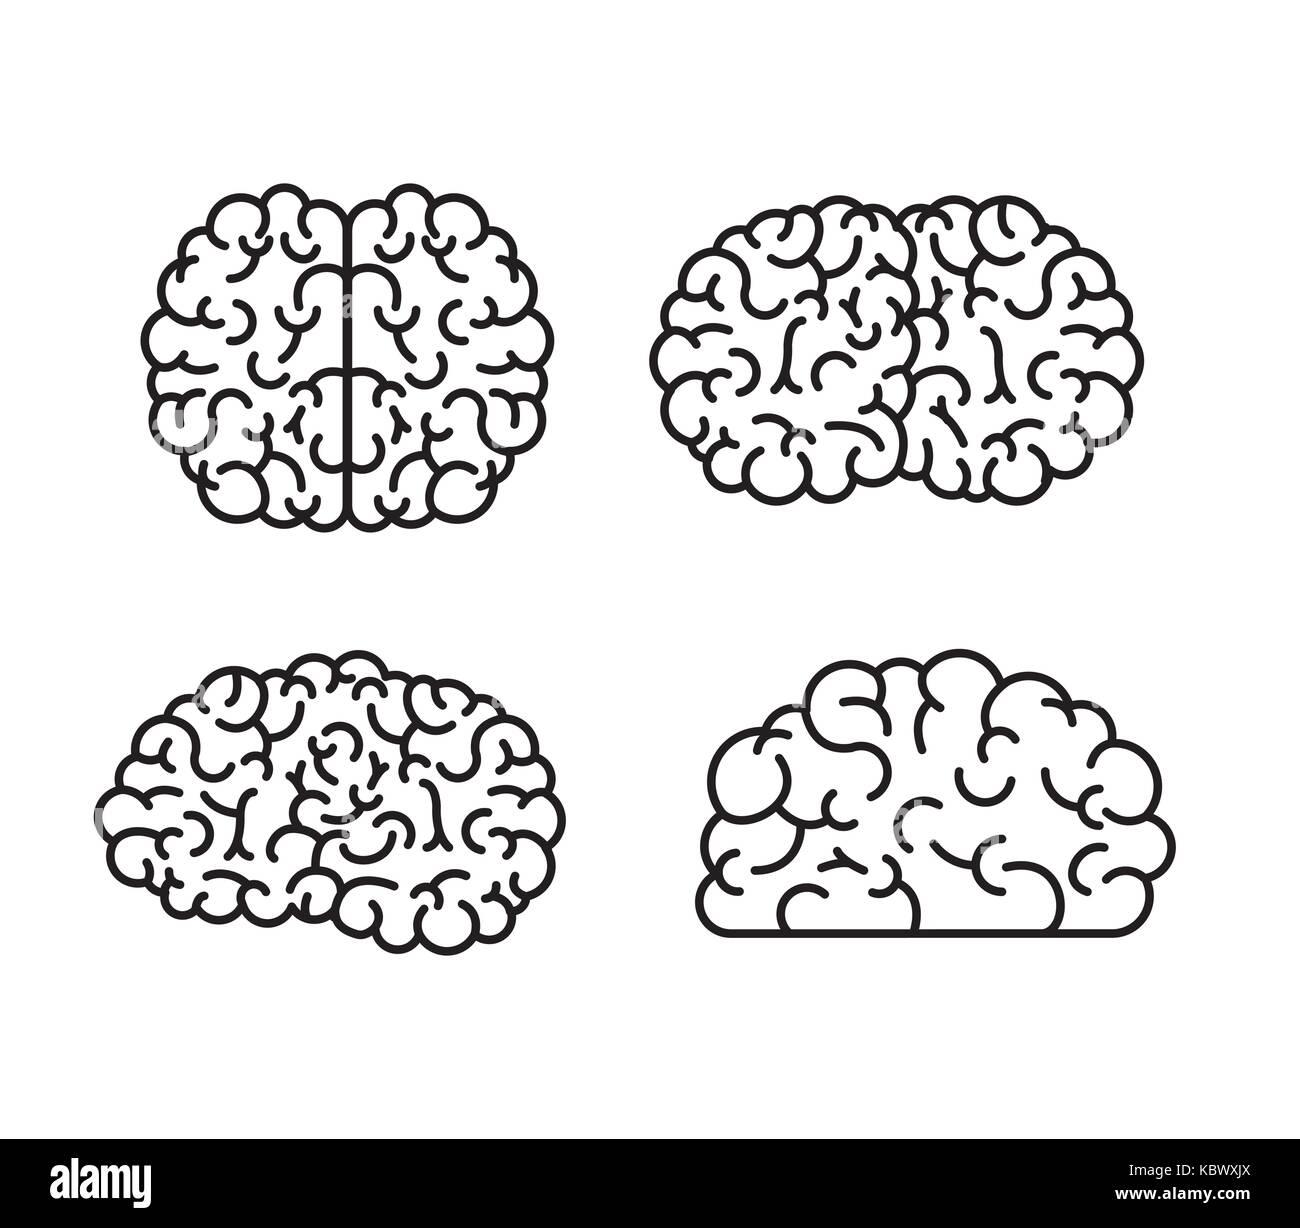 brain monochrome silhouettes several views - Stock Image